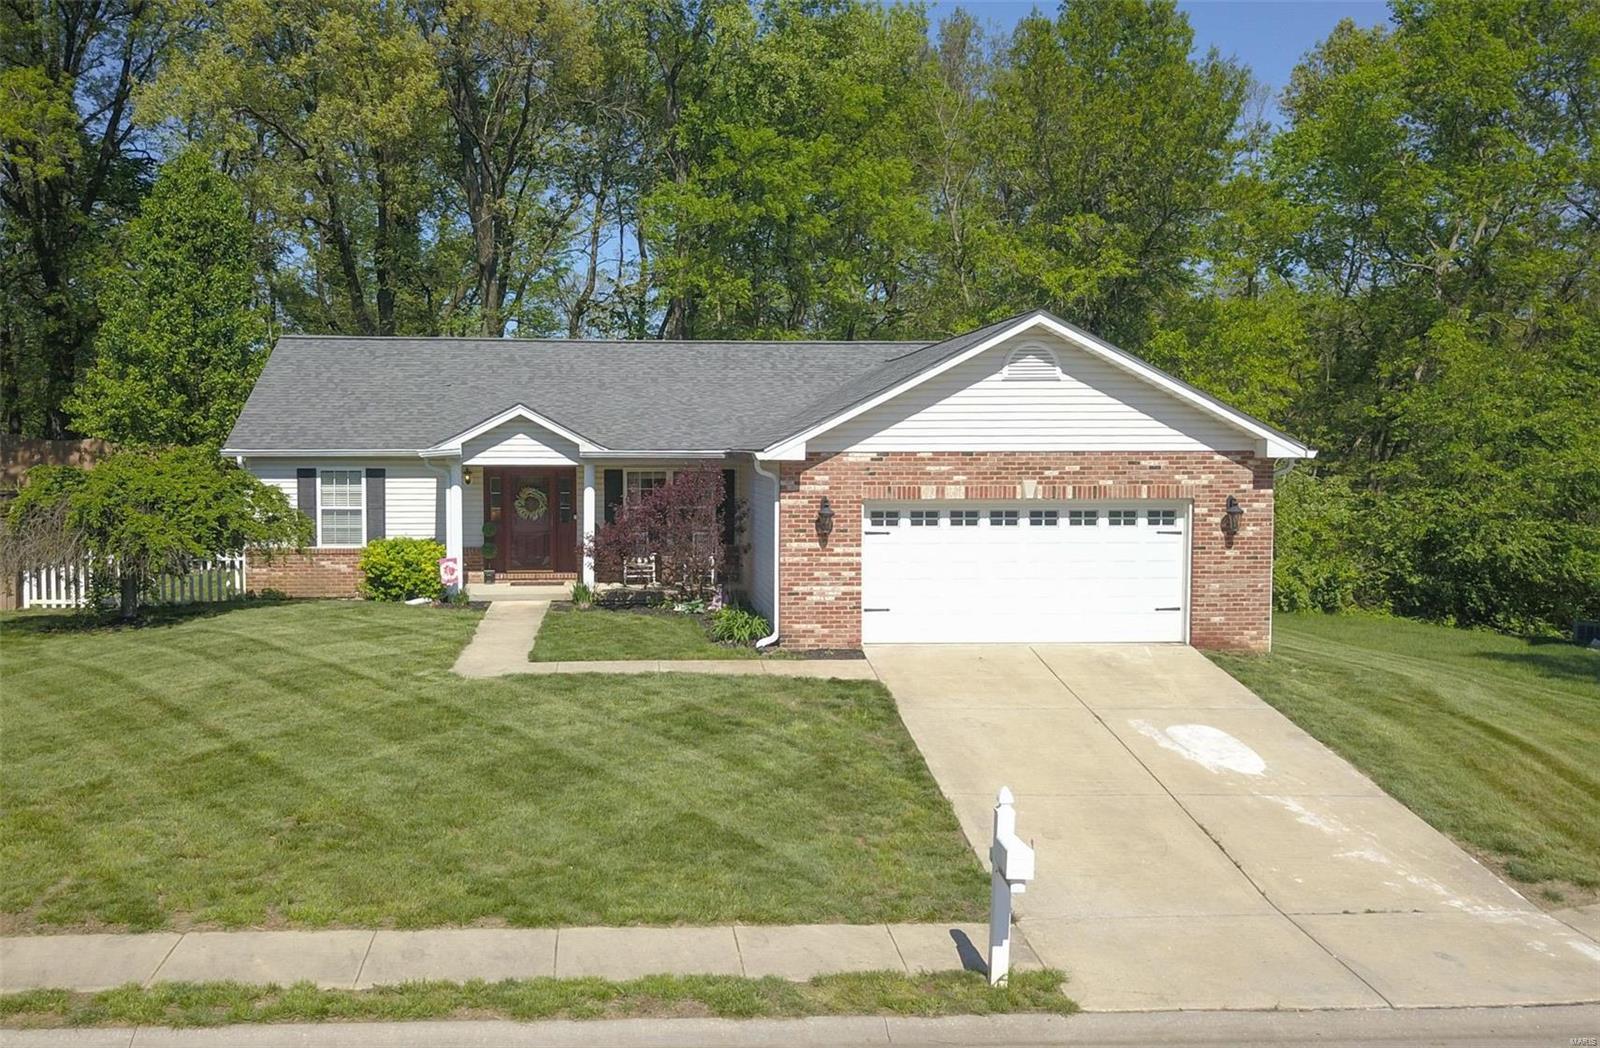 941 Blue Heron Court Property Photo - Belleville, IL real estate listing